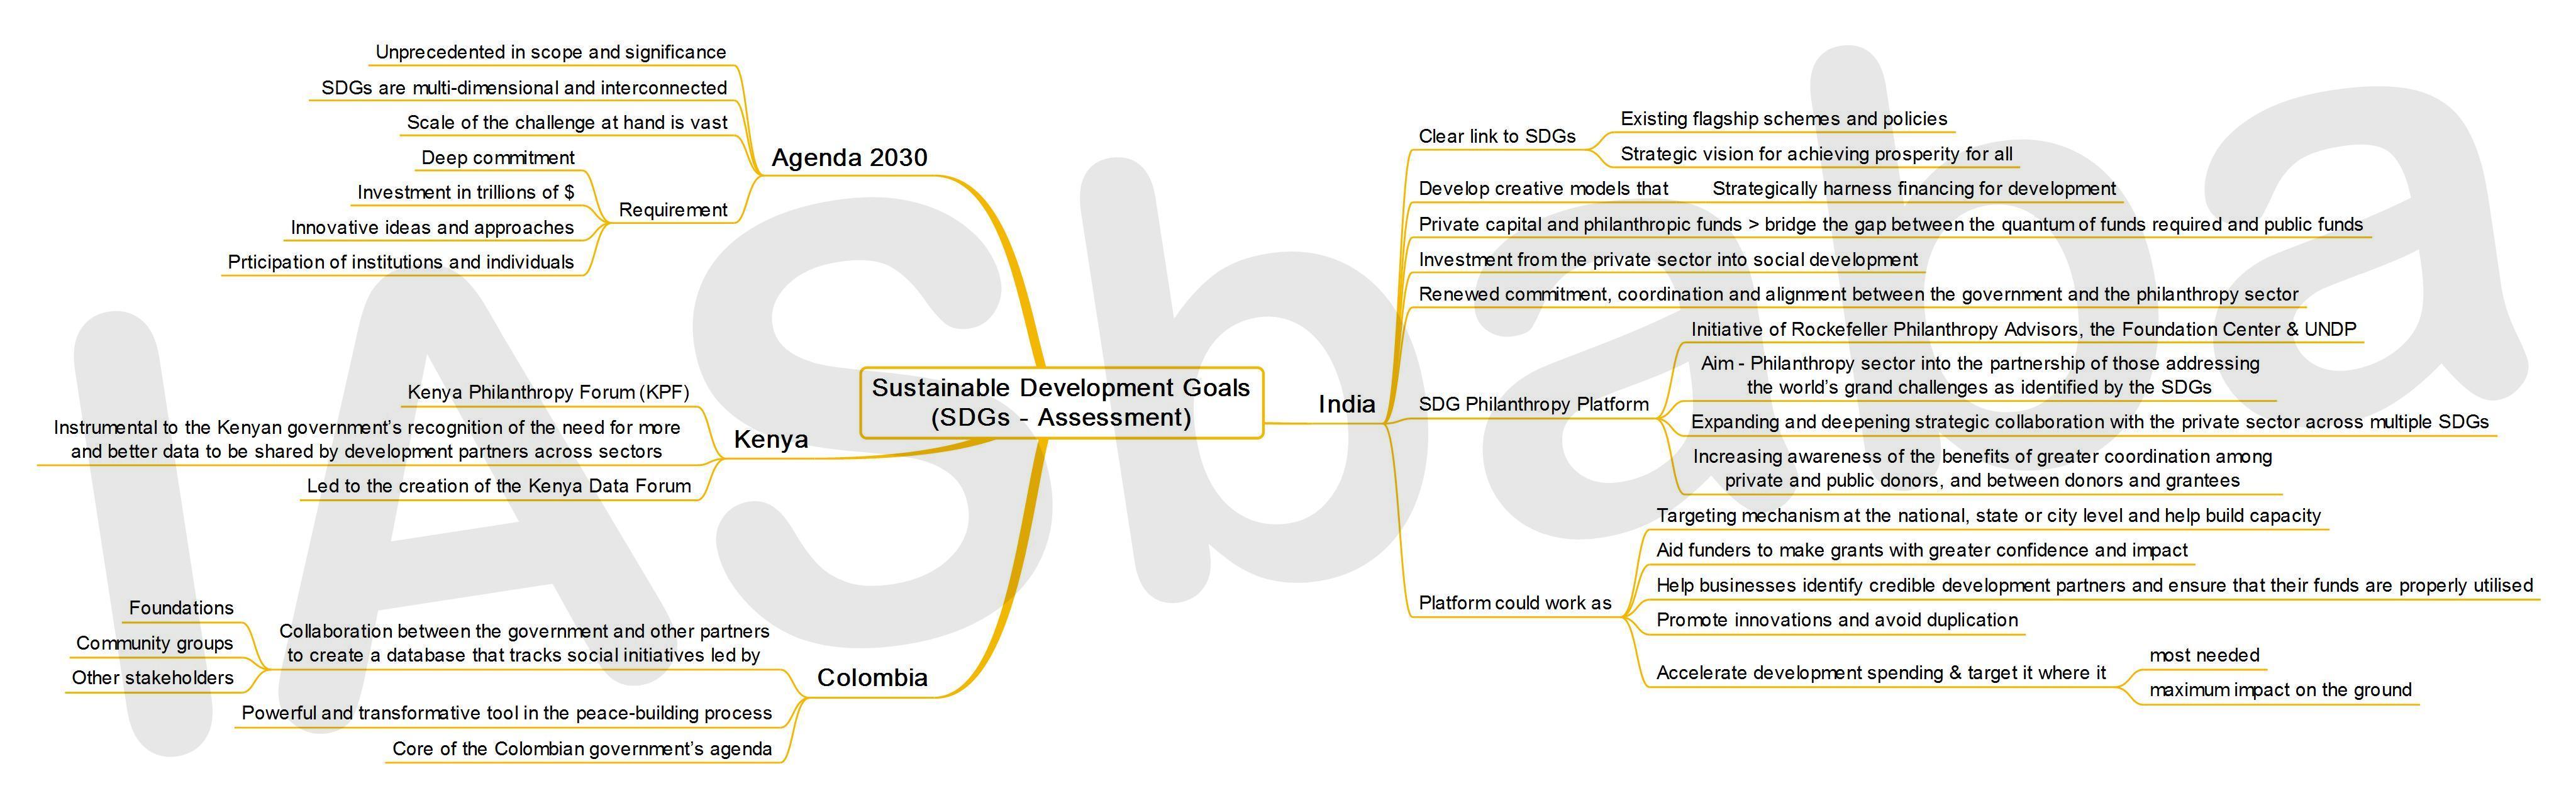 IASbaba's MINDMAP : Issue - Sustainable Development Goals - Assessment